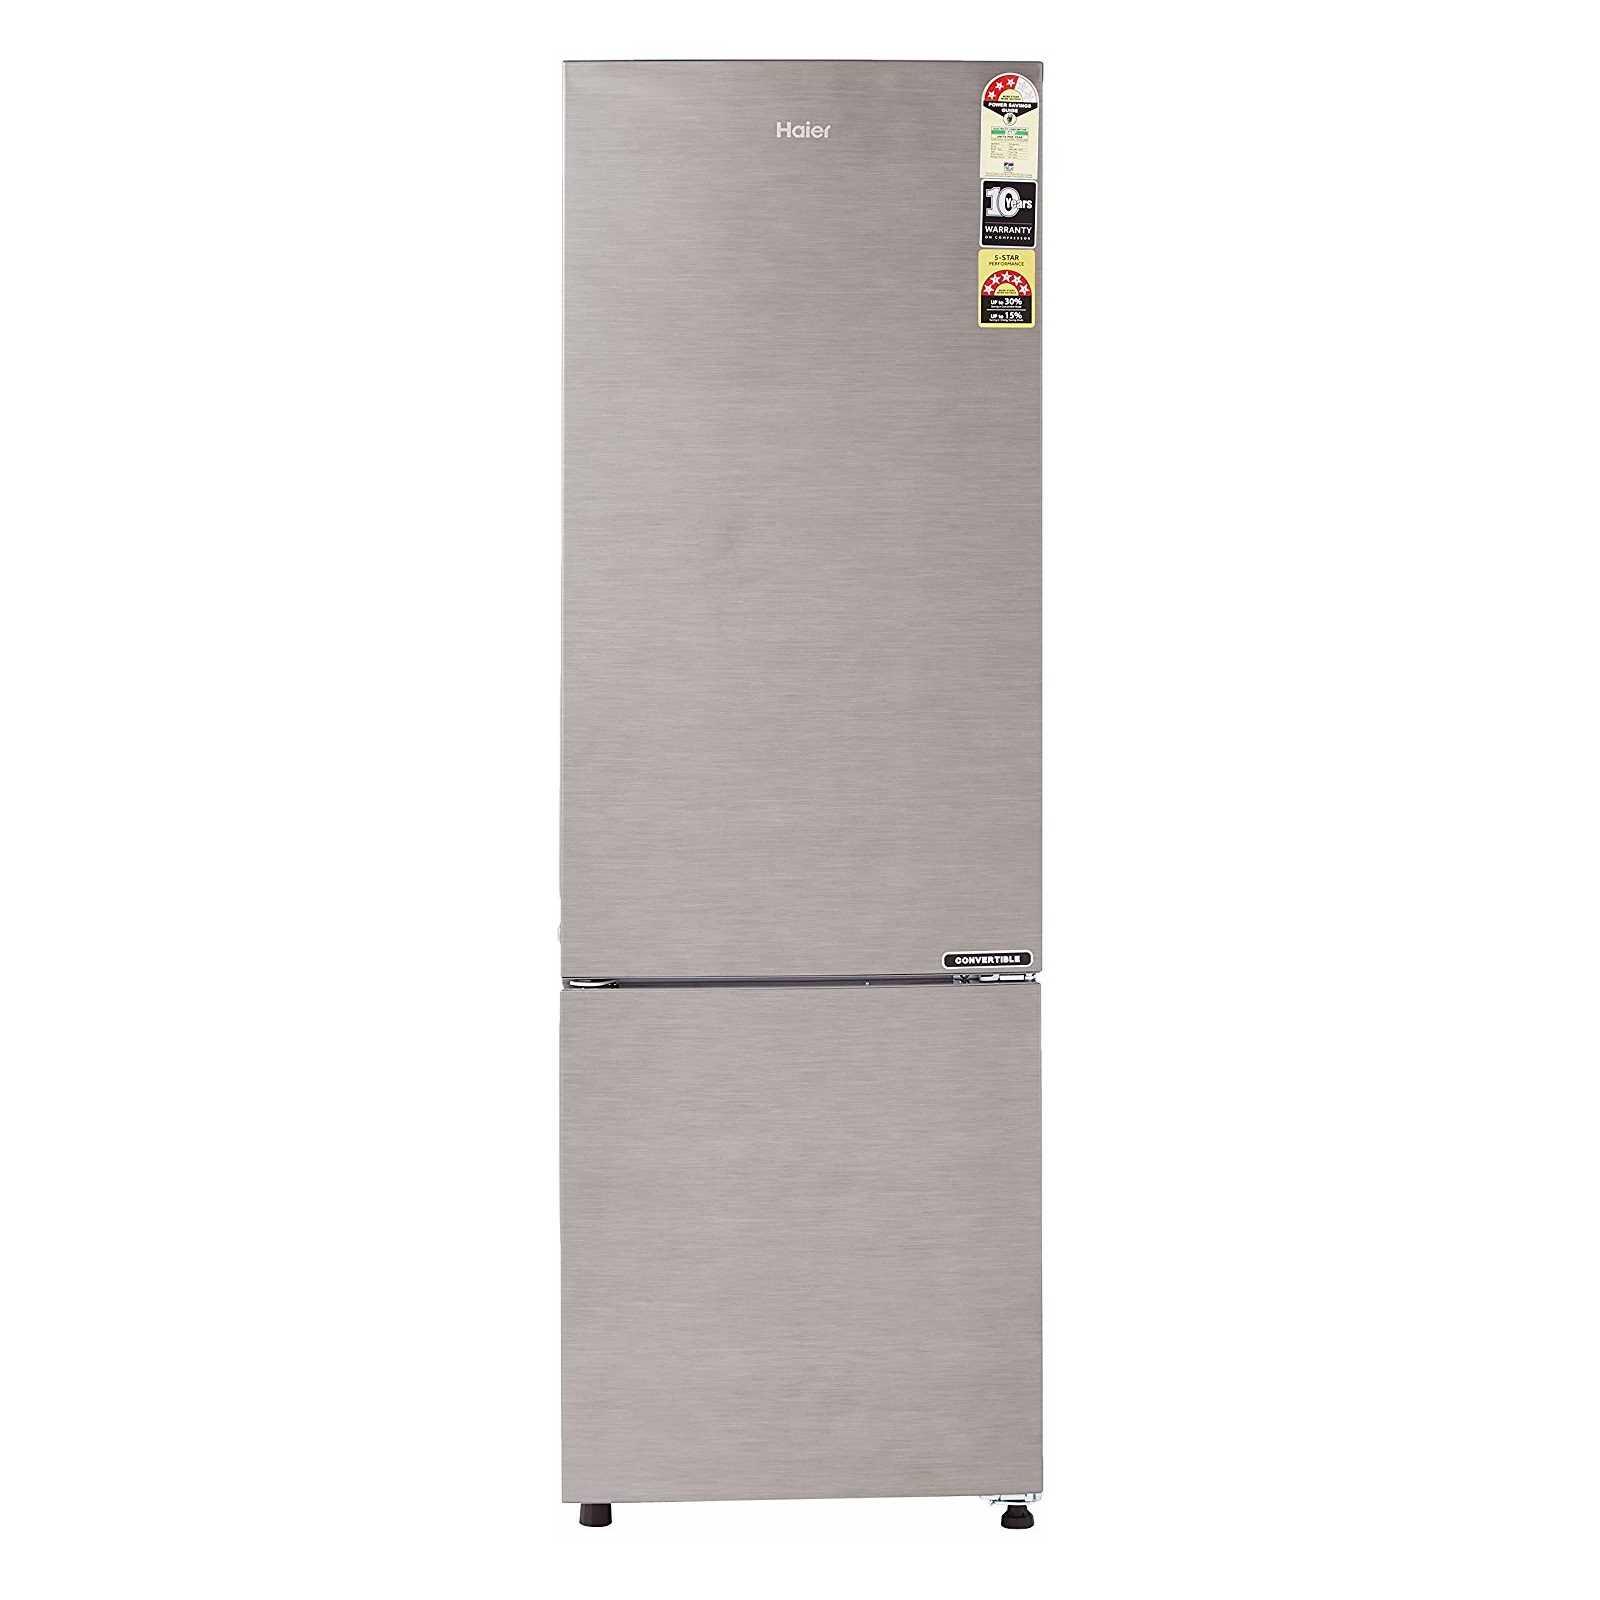 Haier HEB 27TDS 276 Litre Frost Free Double Door Refrigerator